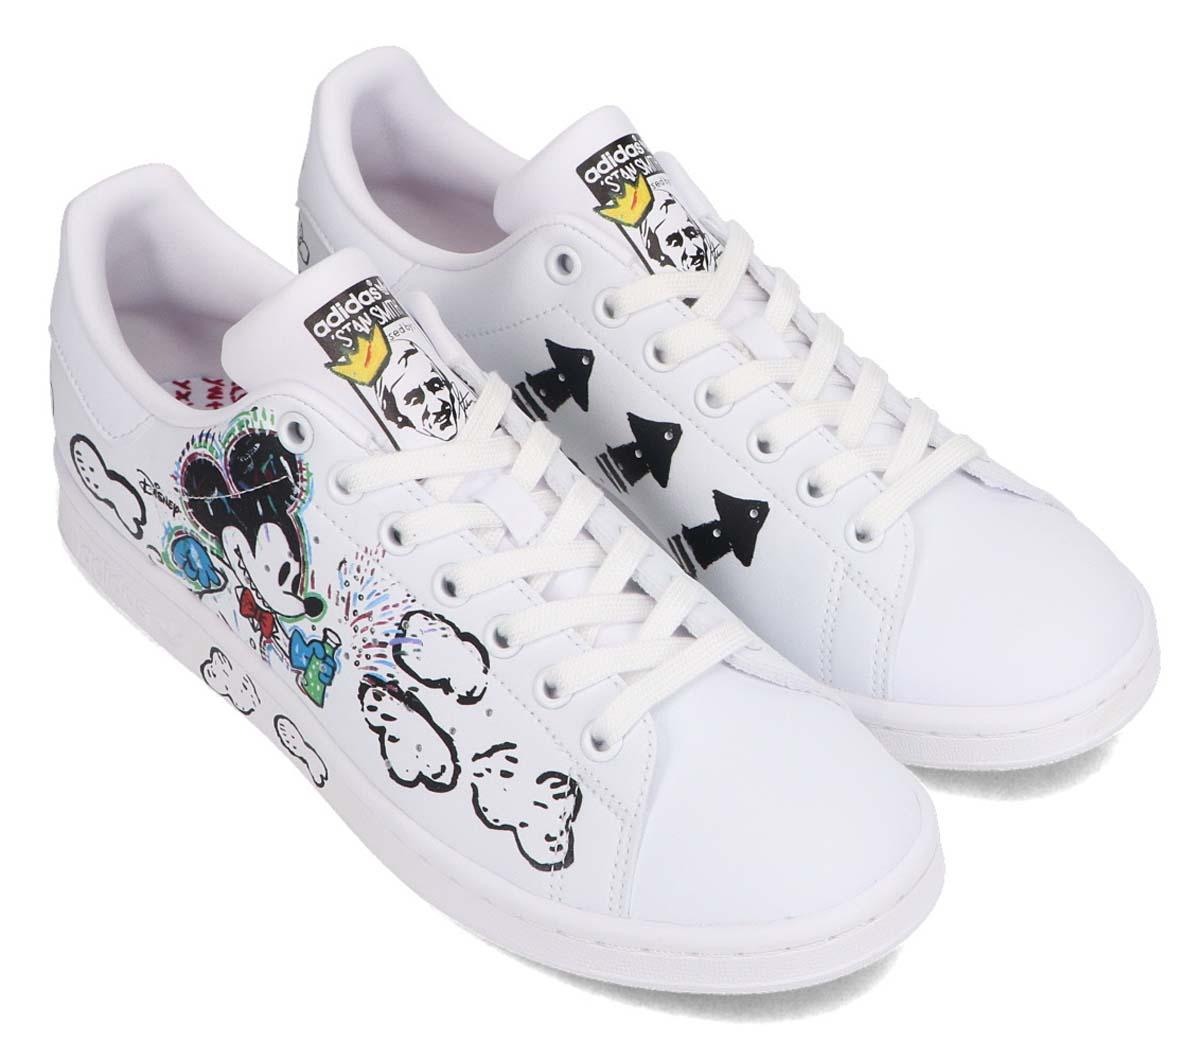 adidas STAN SMITH Kasing Lung x Mickey Mouse x adidas Mickey Twist FOOTWEAR WHITE / FOOTWEAR WHITE / CORE BLACK GZ8841 アディダス スタンスミス  ホワイト/マルチカラー